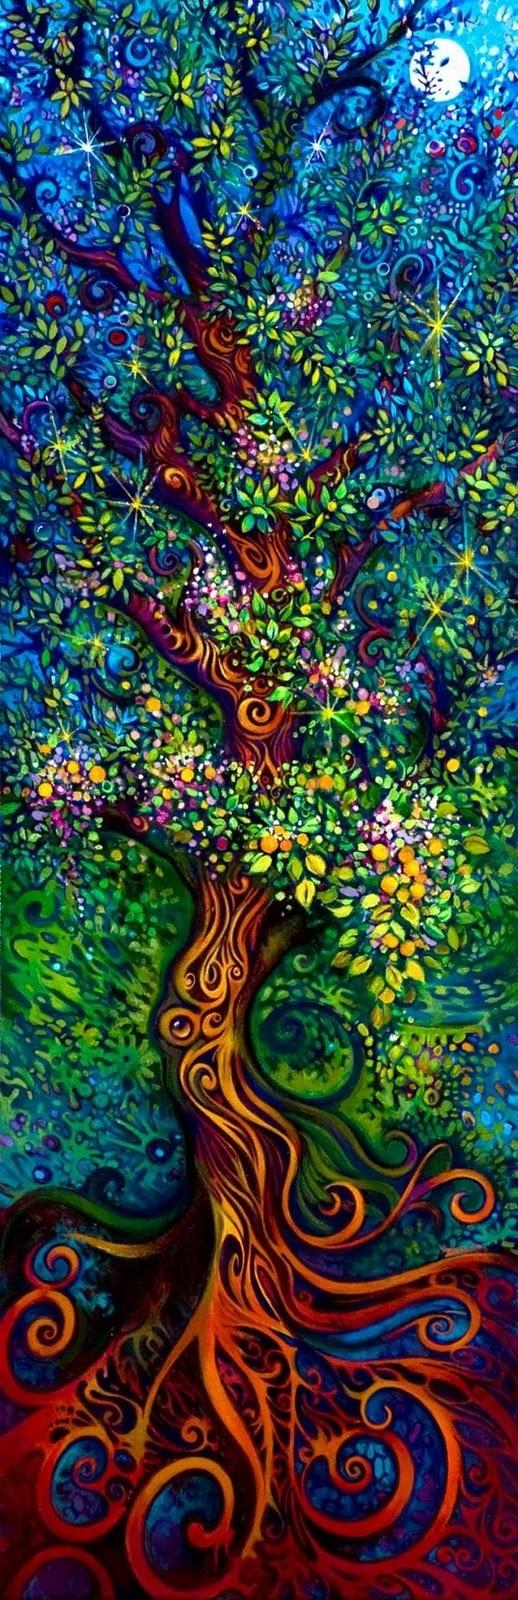 The Tree of Life ~ Artist: Laura Zollar